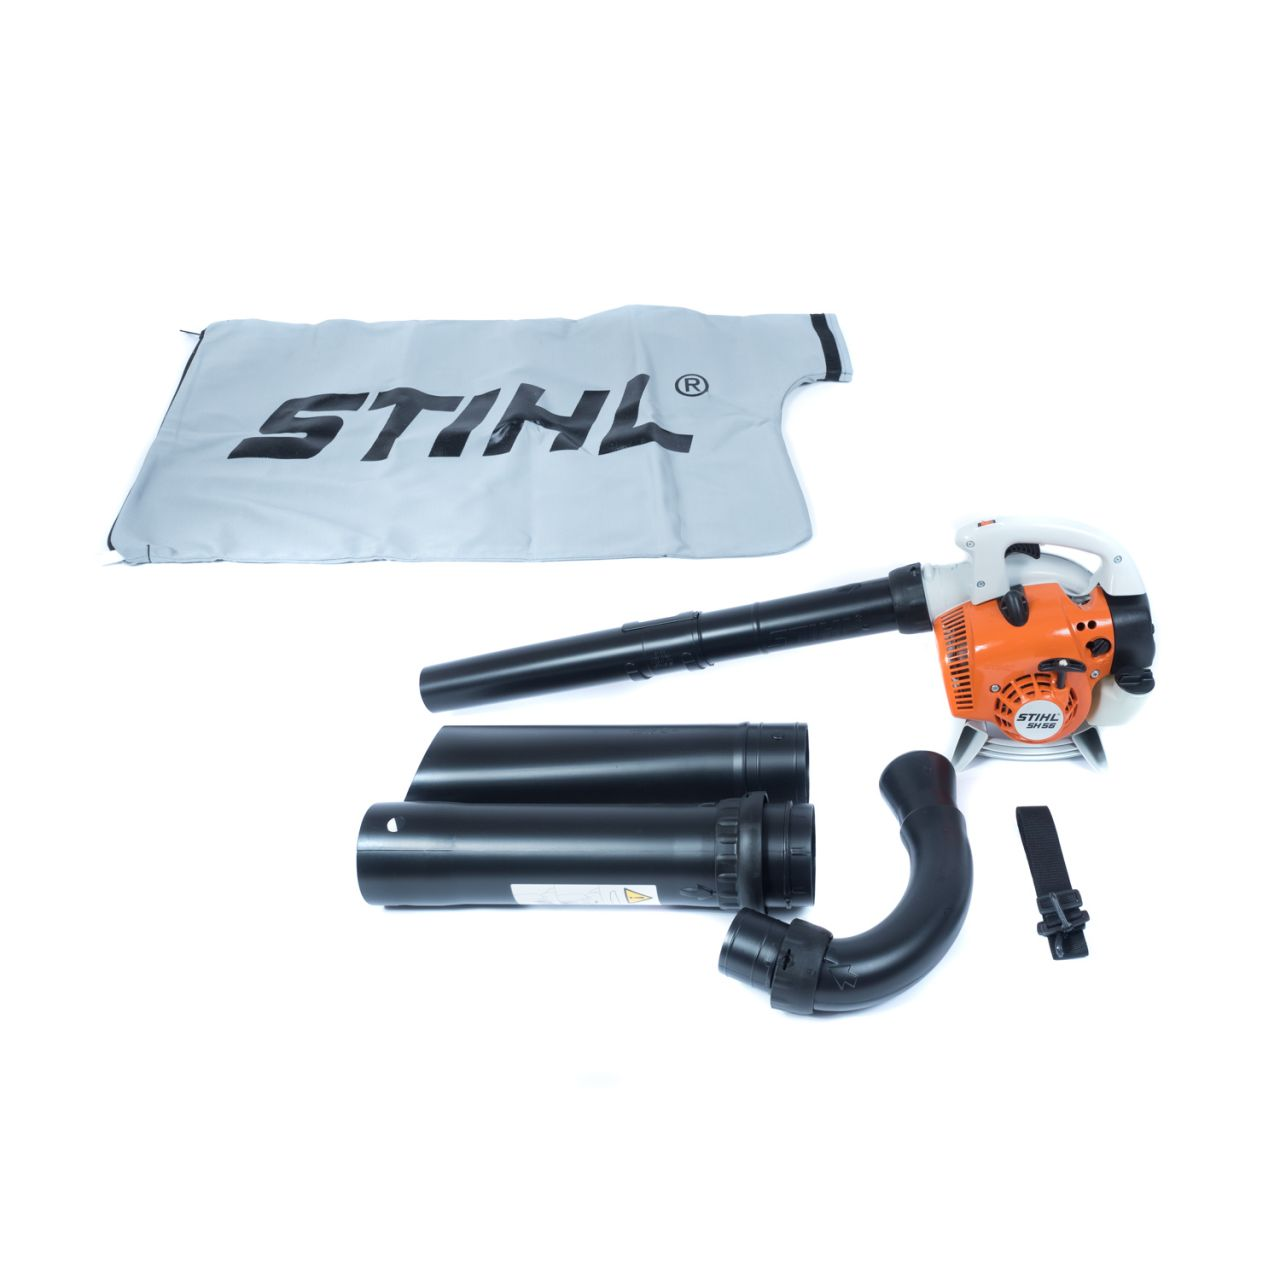 STIHL SH 56 Saughäcksler & Laubbläser 42410110920